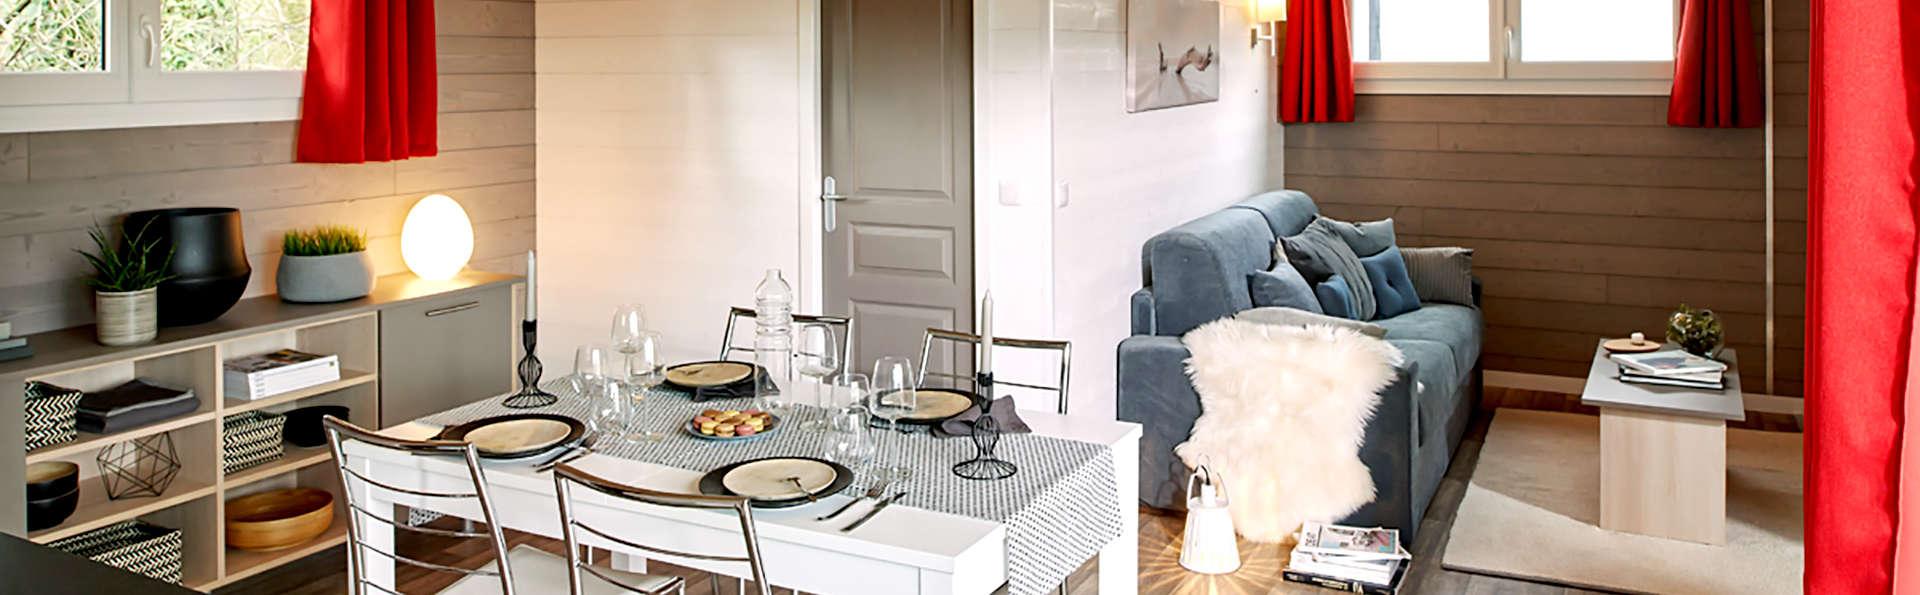 Domaine du Moulin Neuf - Edit_Apartment3.jpg